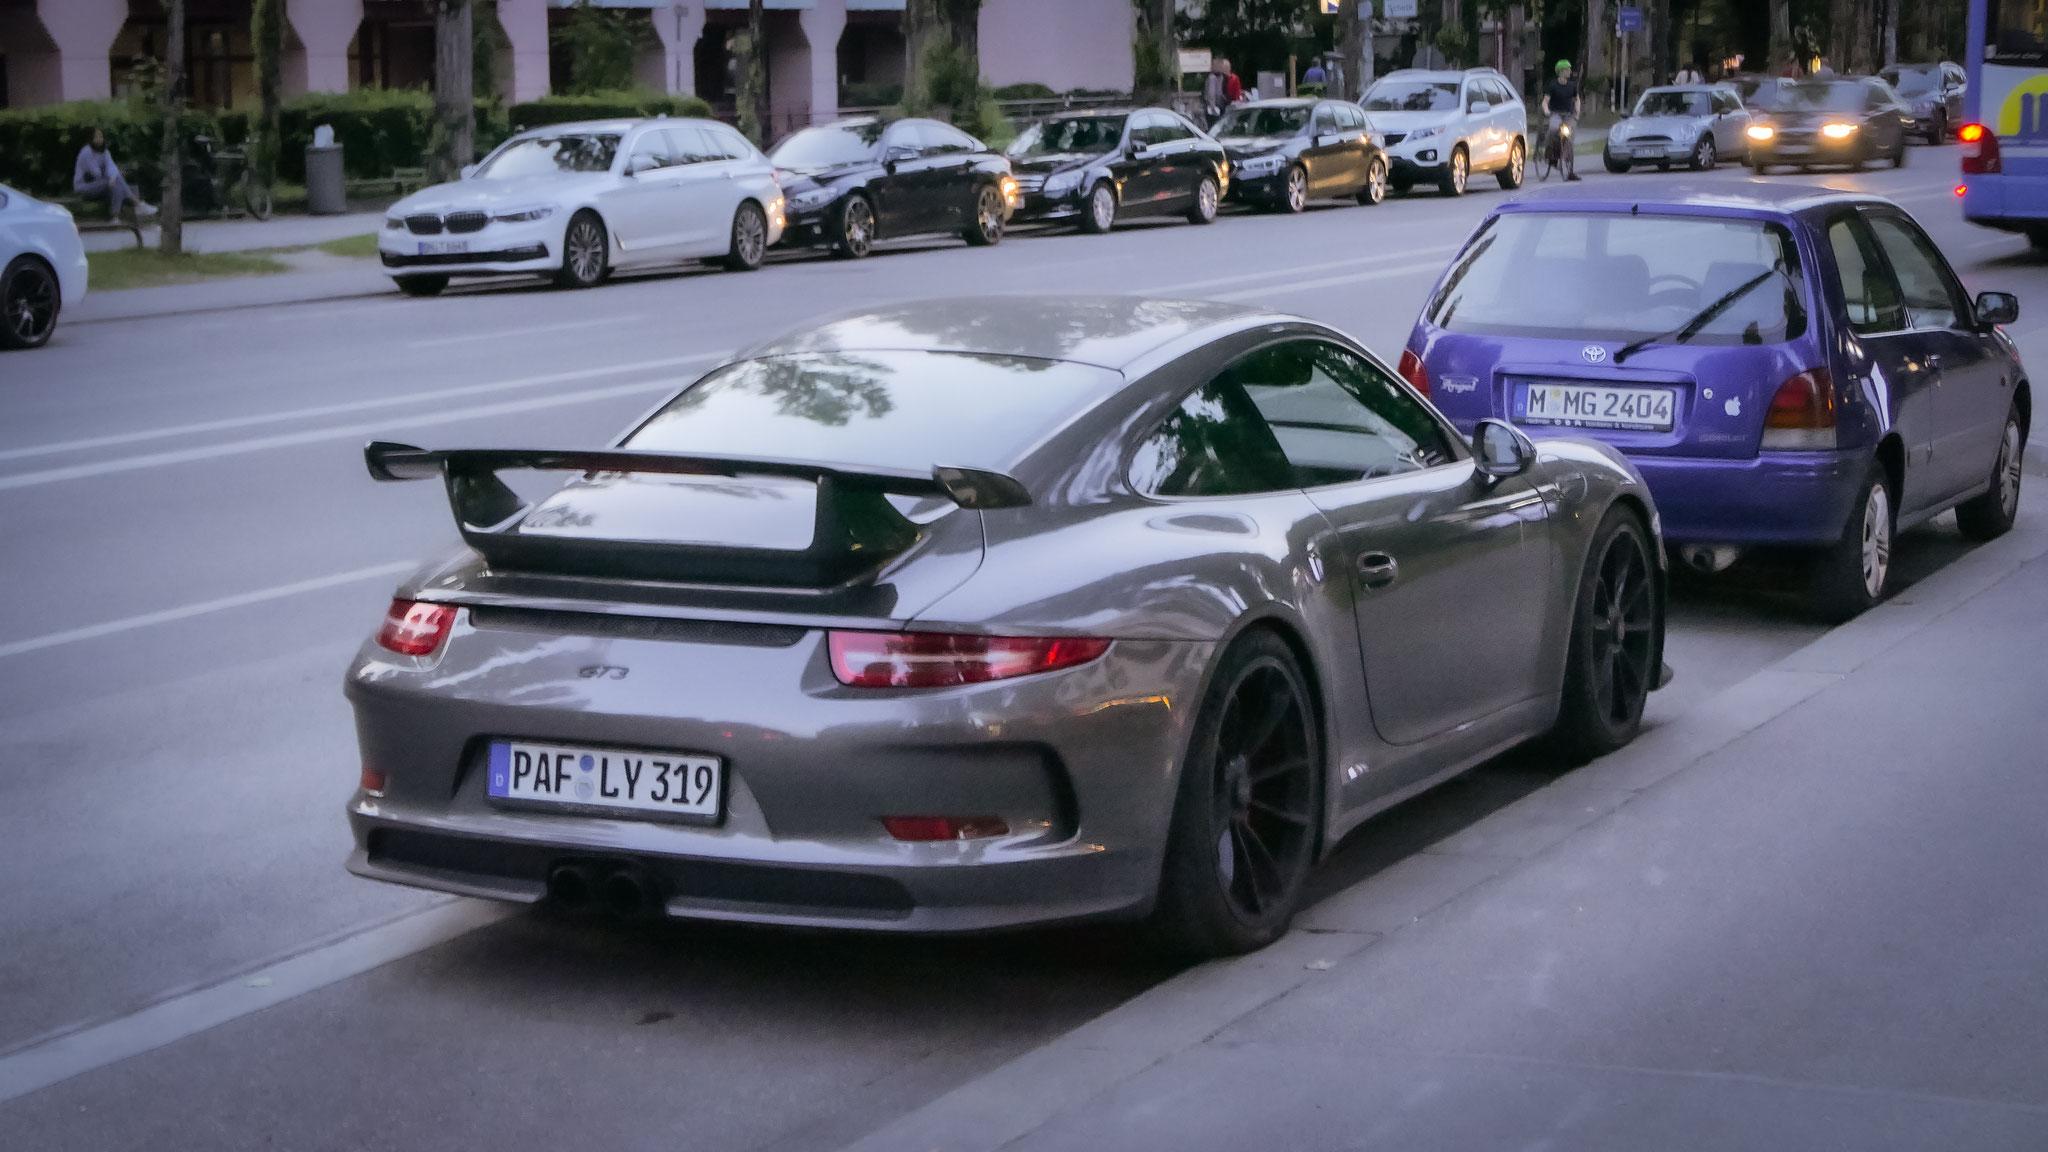 Porsche 991 GT3 - PAF-LY-319